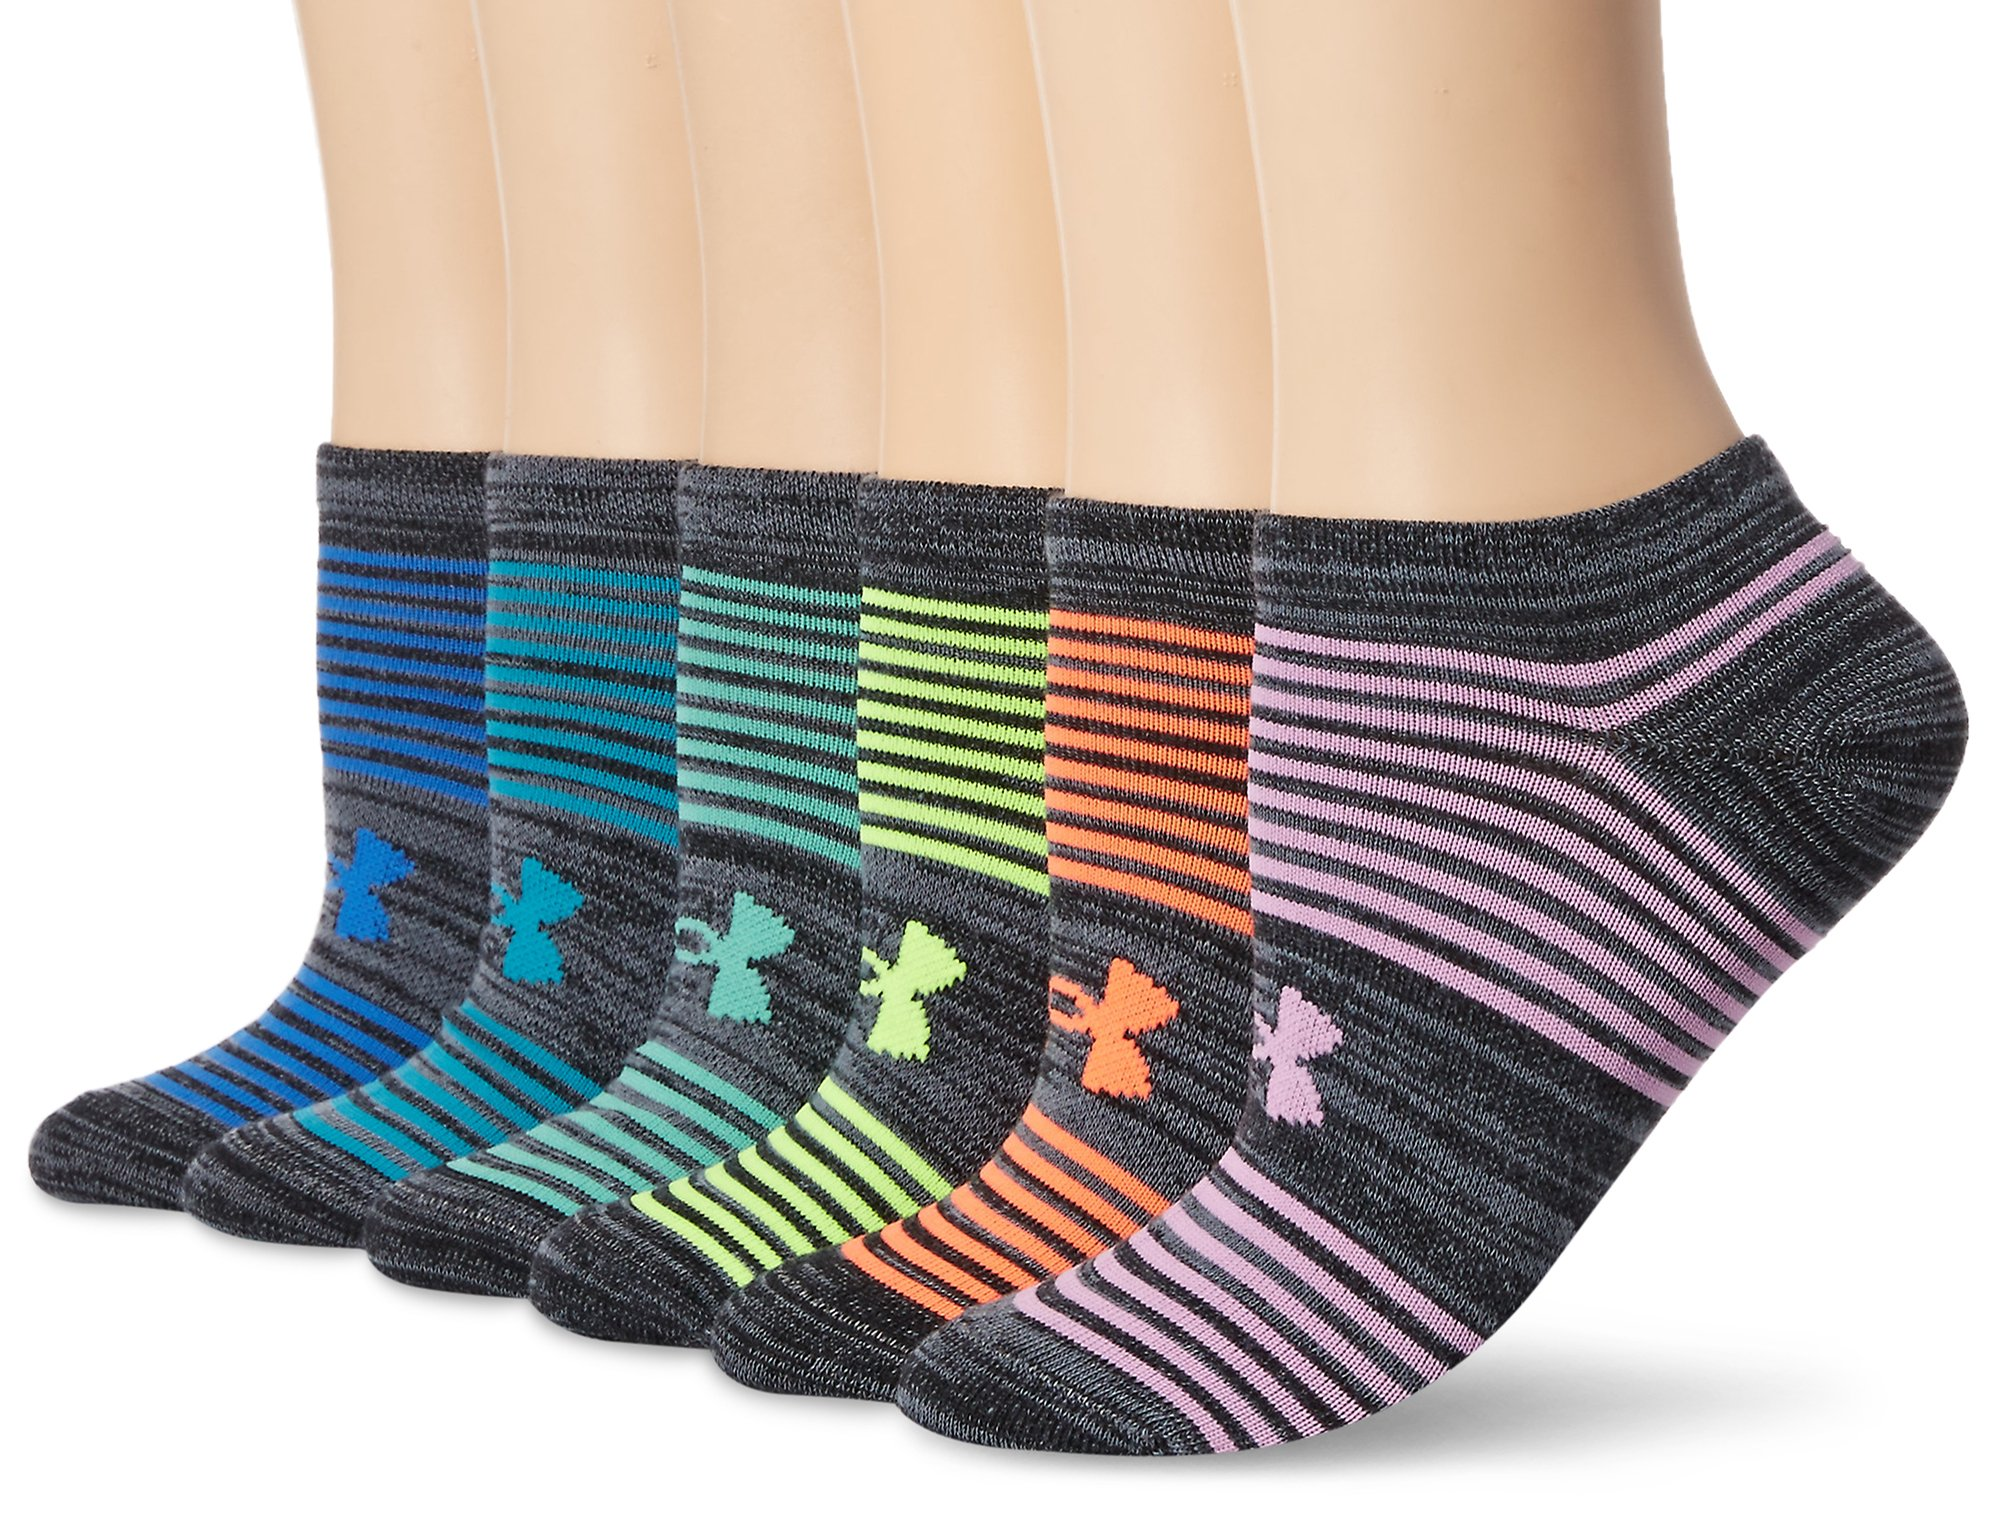 e56f9d0df03 Under Armour Women s Essential Twist 2.0 No Show Socks (6 Pack) product  image